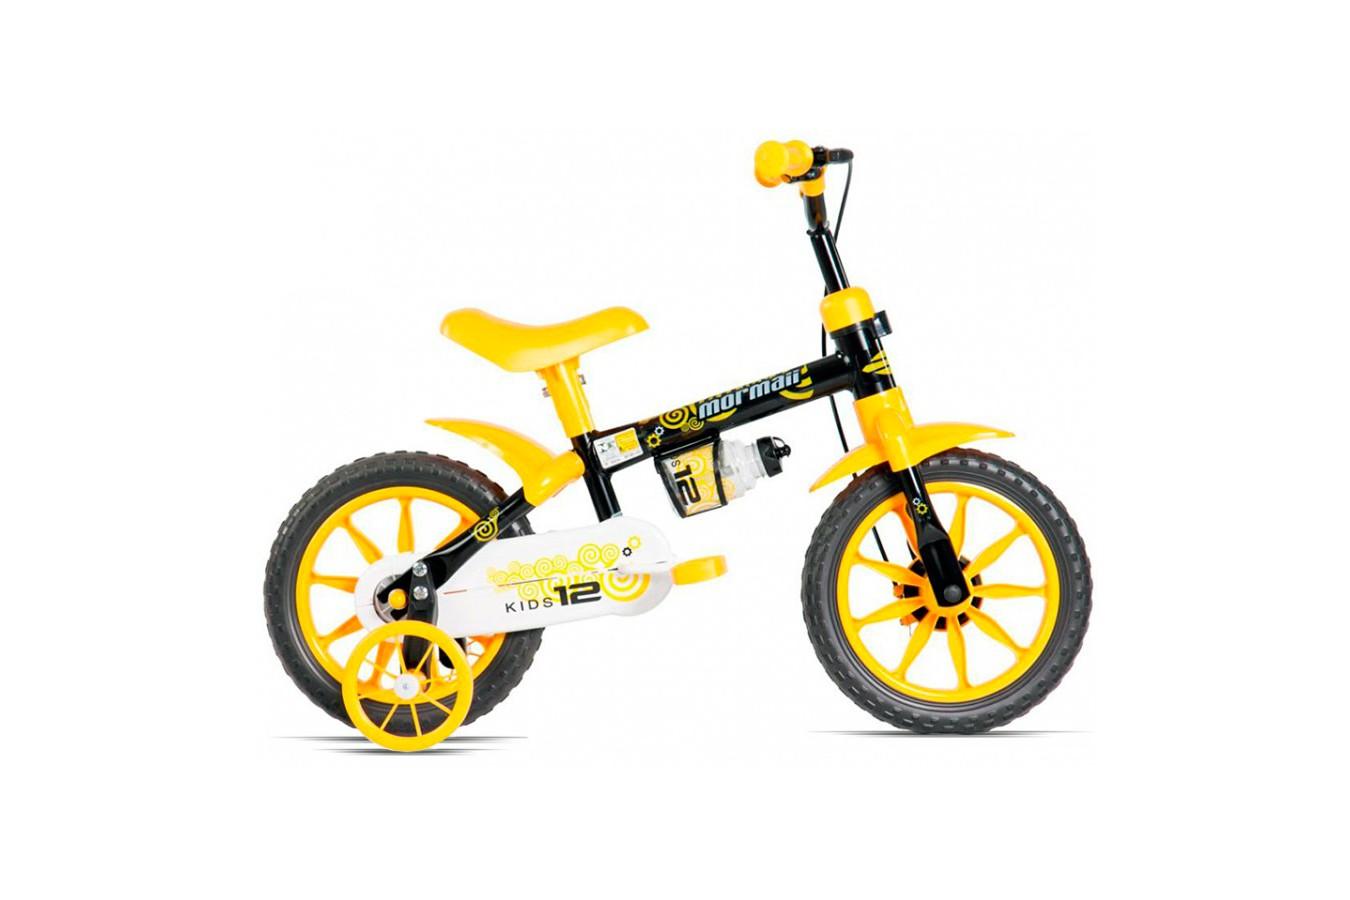 Bicicleta 12 Kids - Mormaii Cor Preto Amarelo 7ea3cb5493